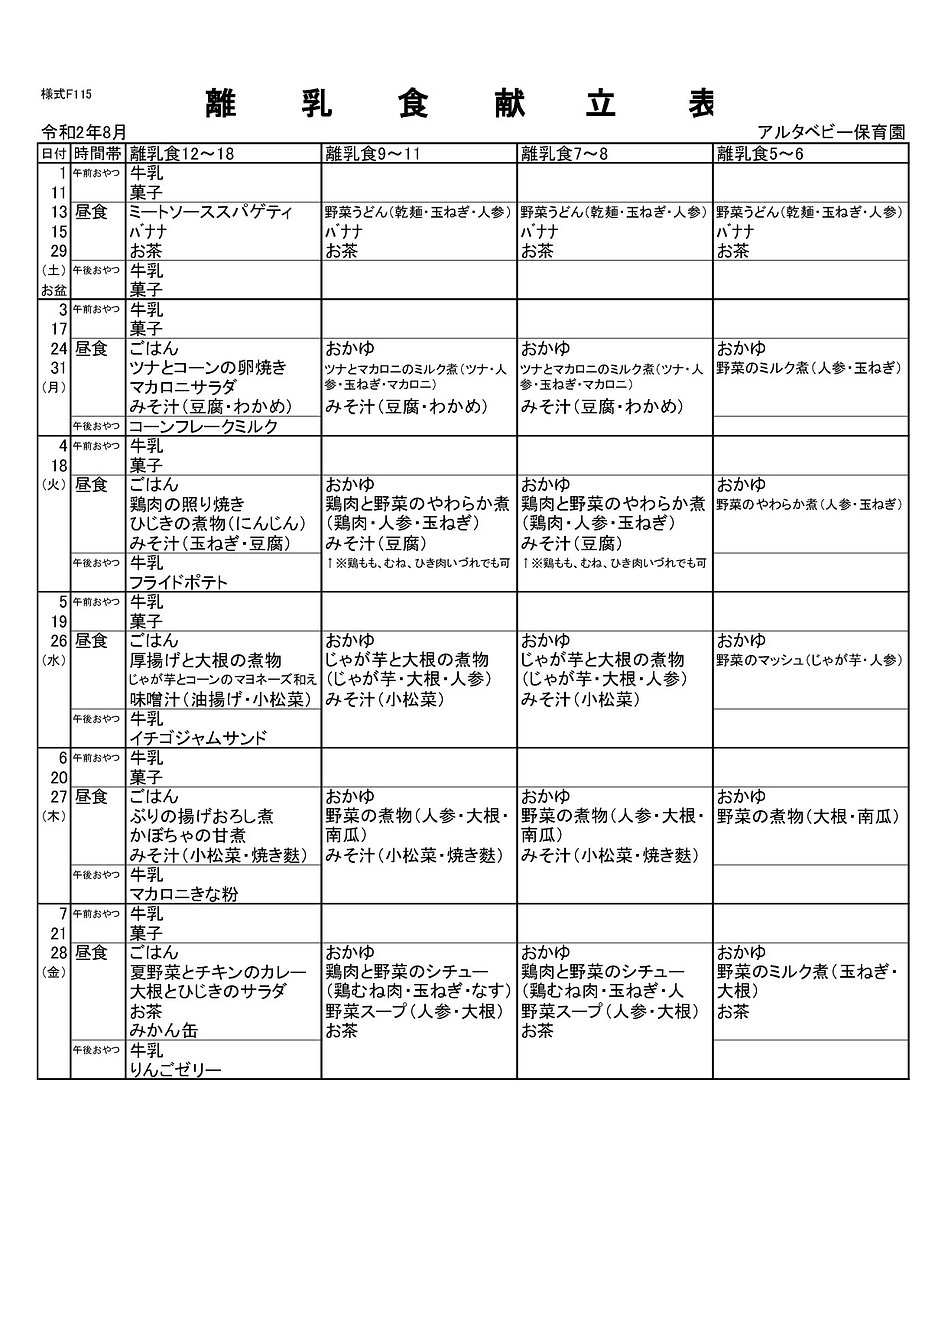 2020.8髮「荵ウ鬟溽鍵遶玖。ィ_001.jpg